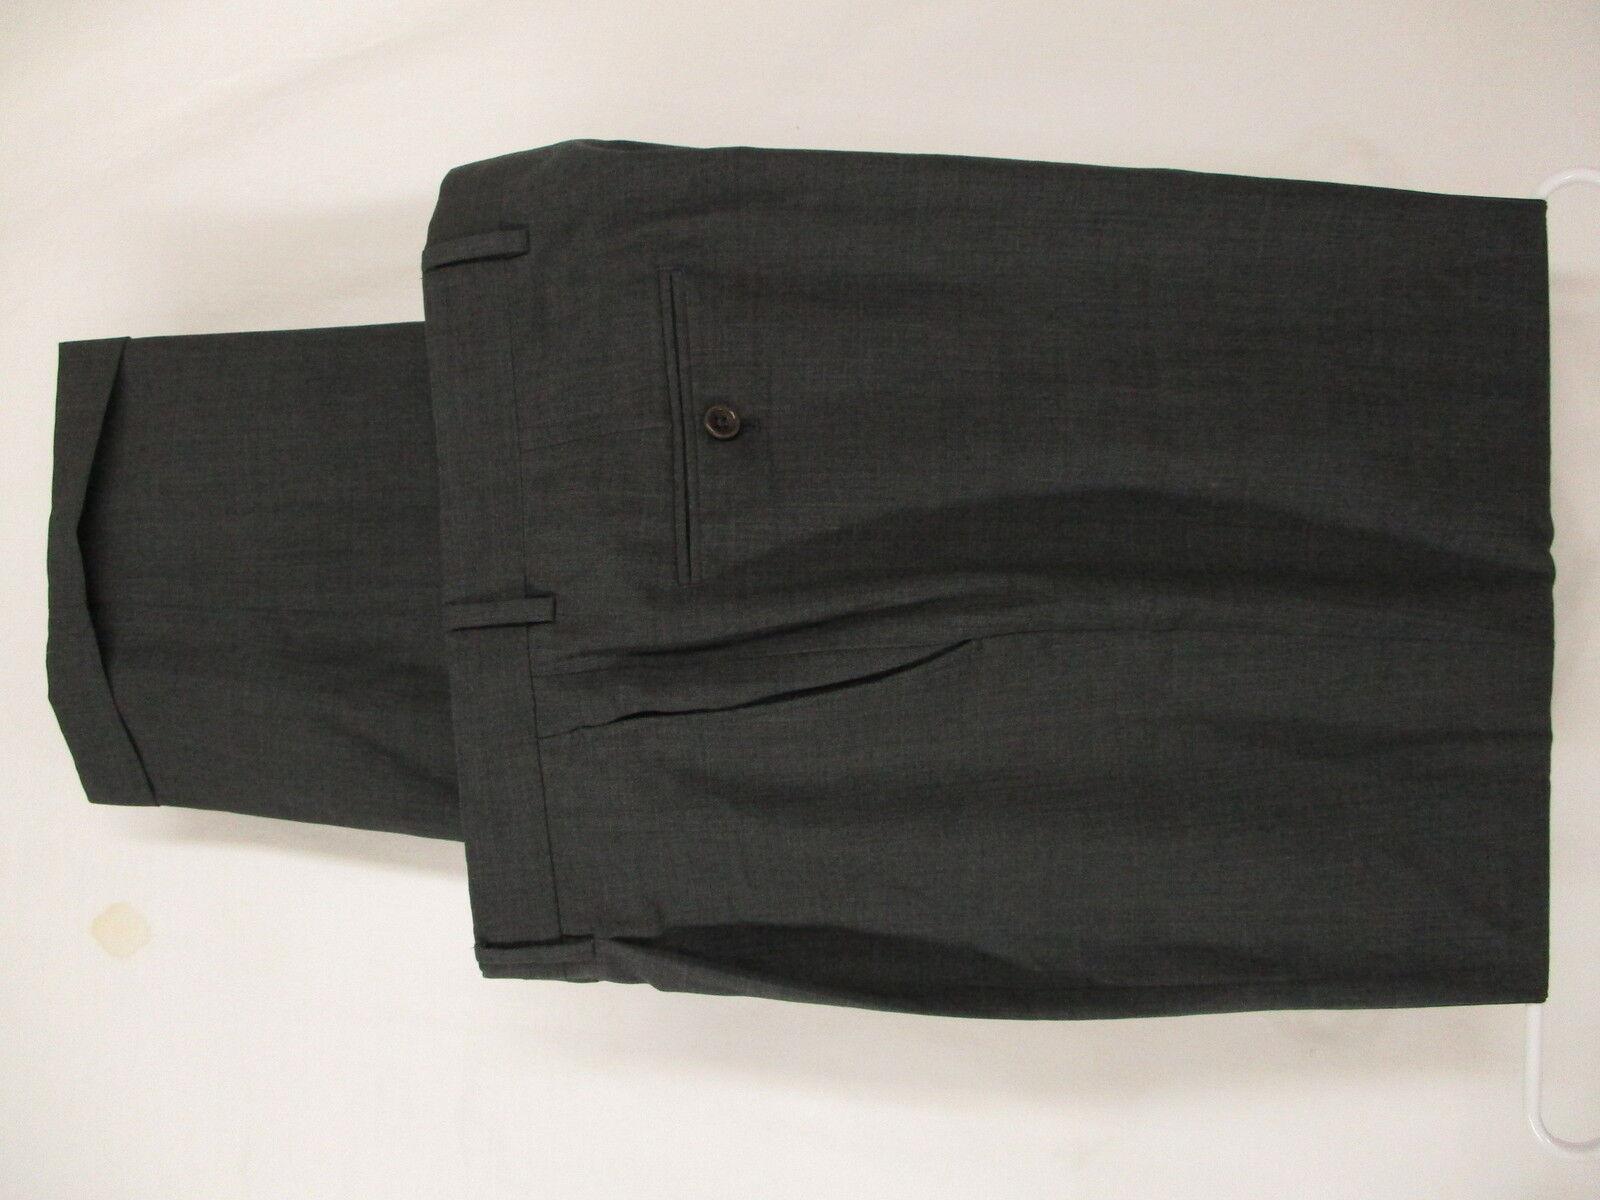 Armani Collezioni Mens Charcoal Pleated Wool Dress Pants 35x33.5